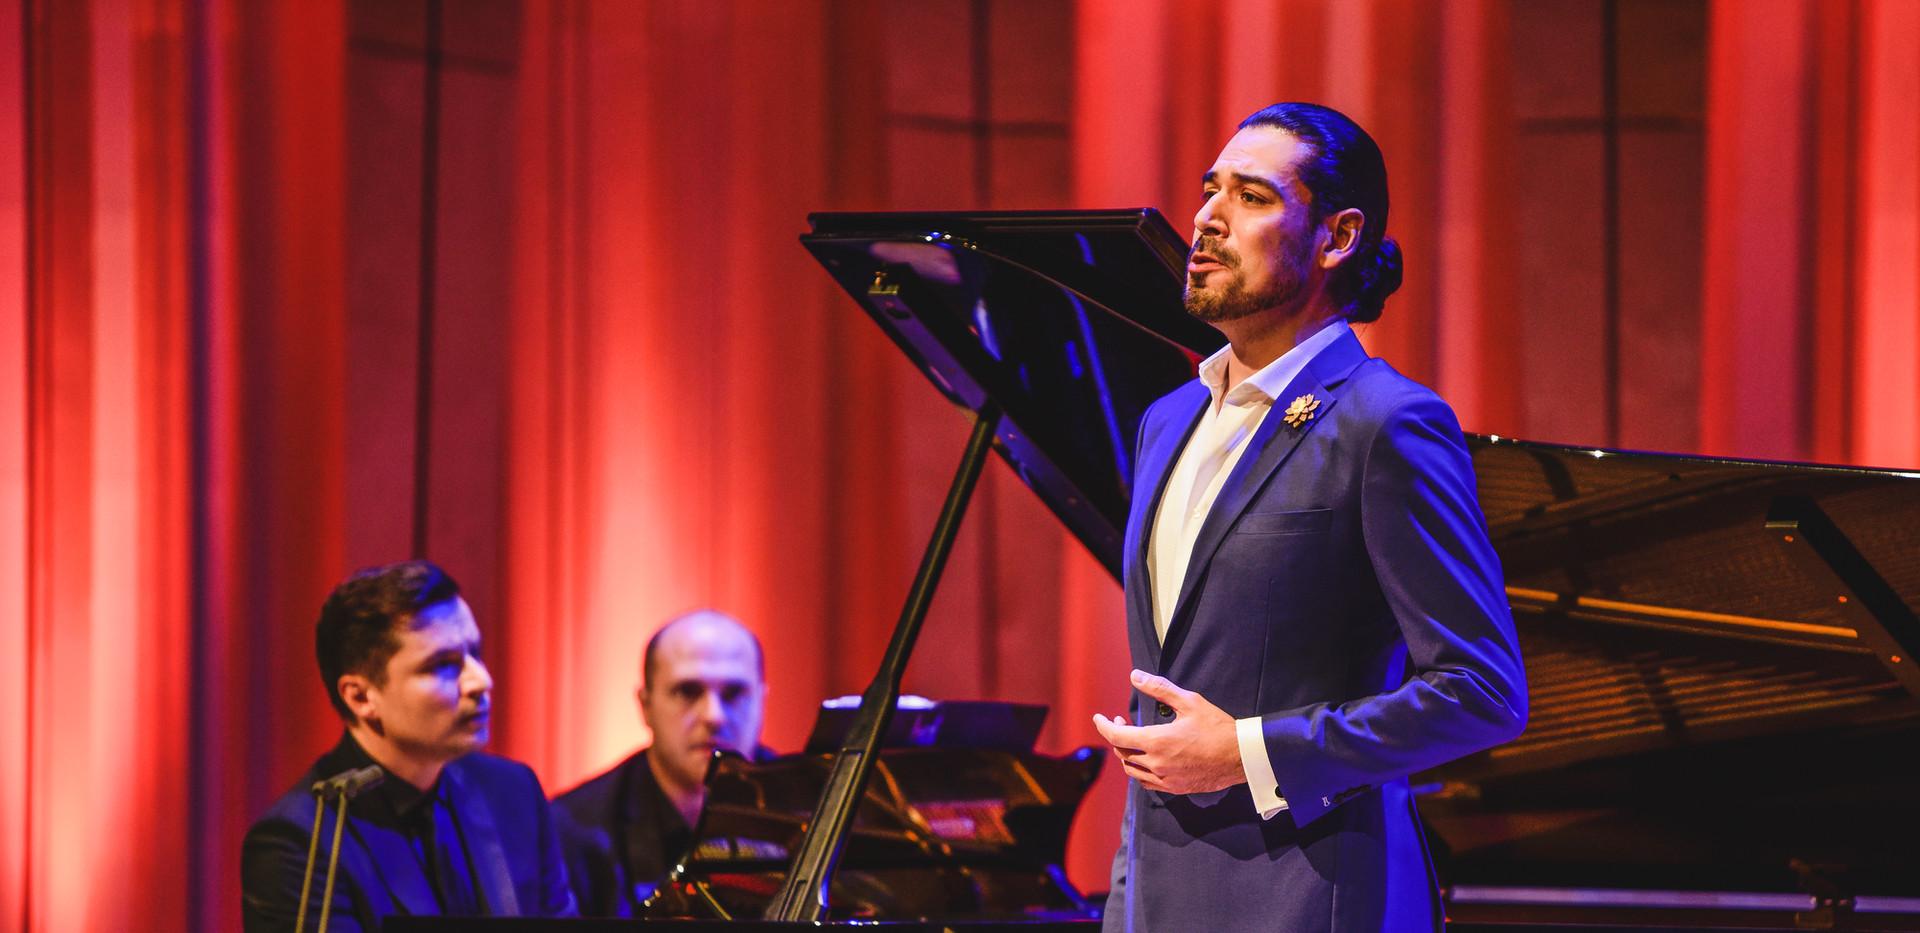 Simon Lepper - piano 2019 BBC Cardiff Singer of the World photo - Kirsten McTernan